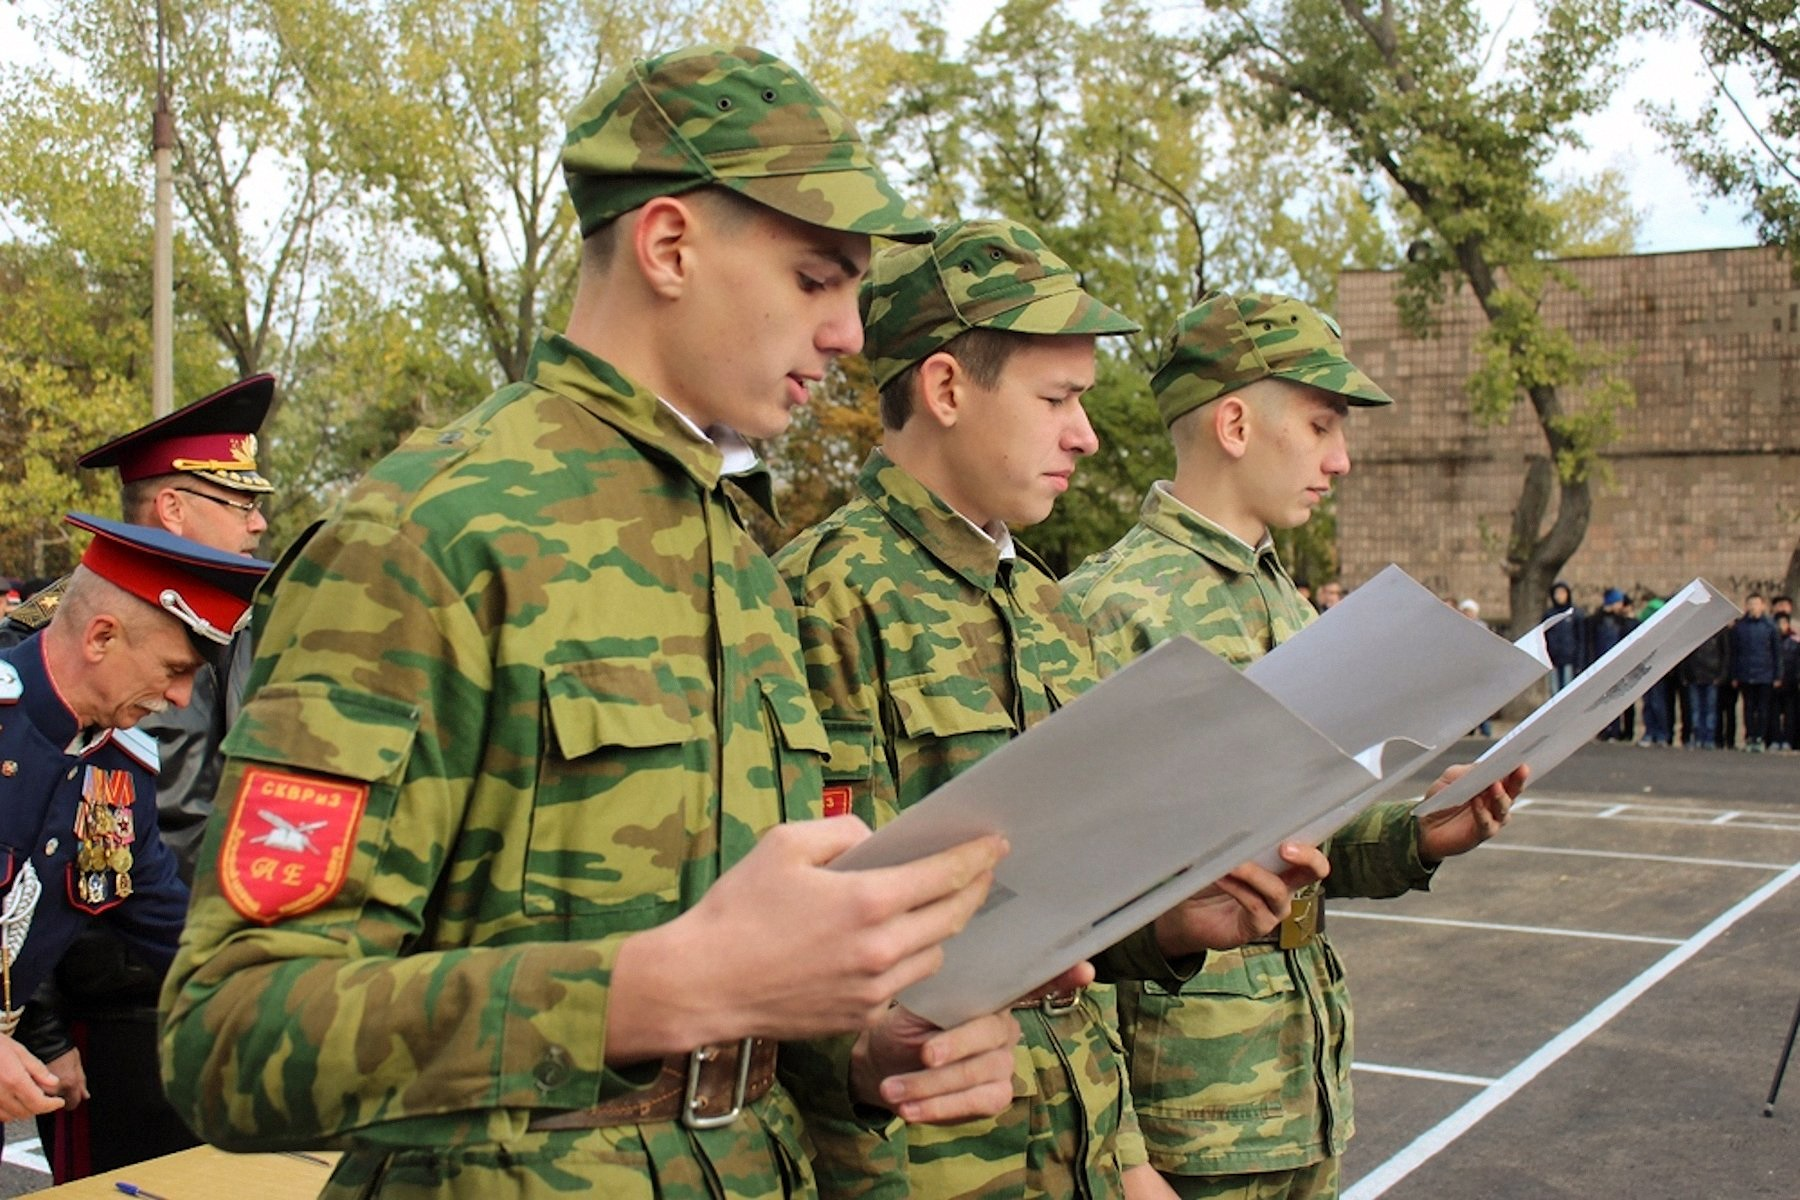 00 lugansk pr lnr cossack cadet corps 04 191015